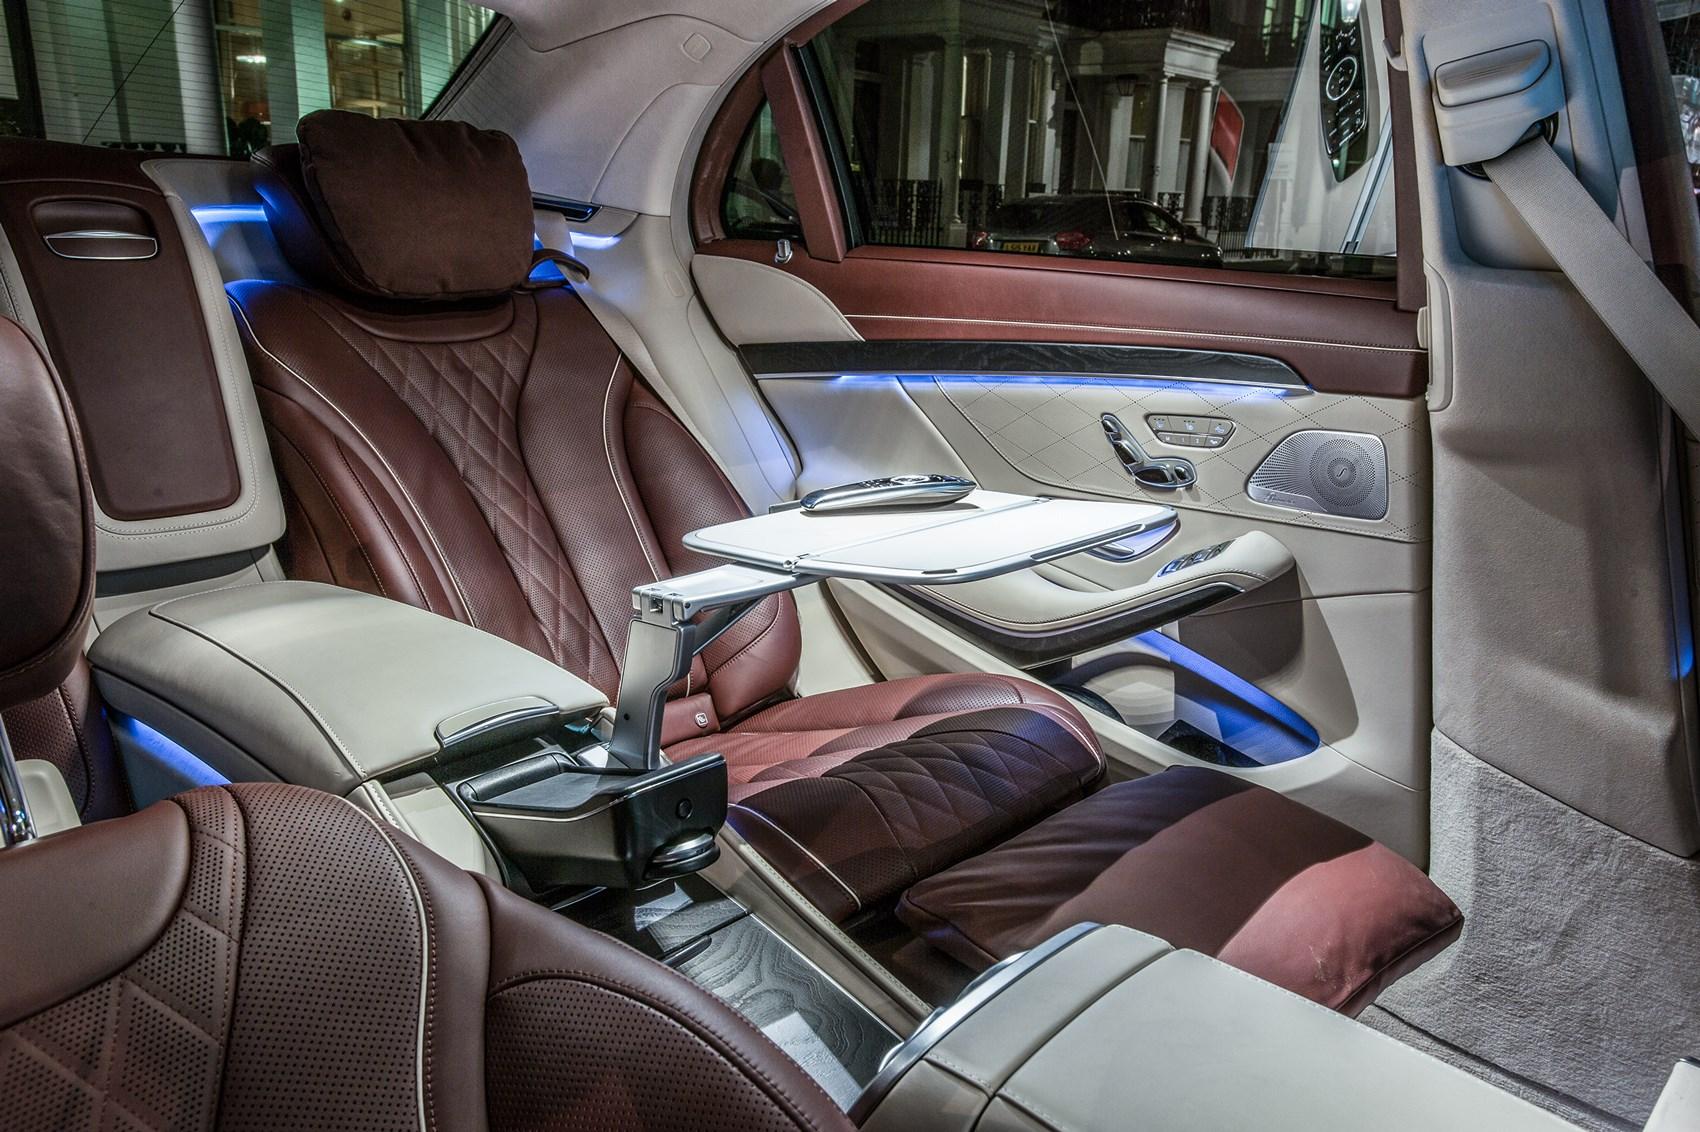 Mercedes S Class Vs Audi A8 Vs Bmw 7 Series 2018 Triple